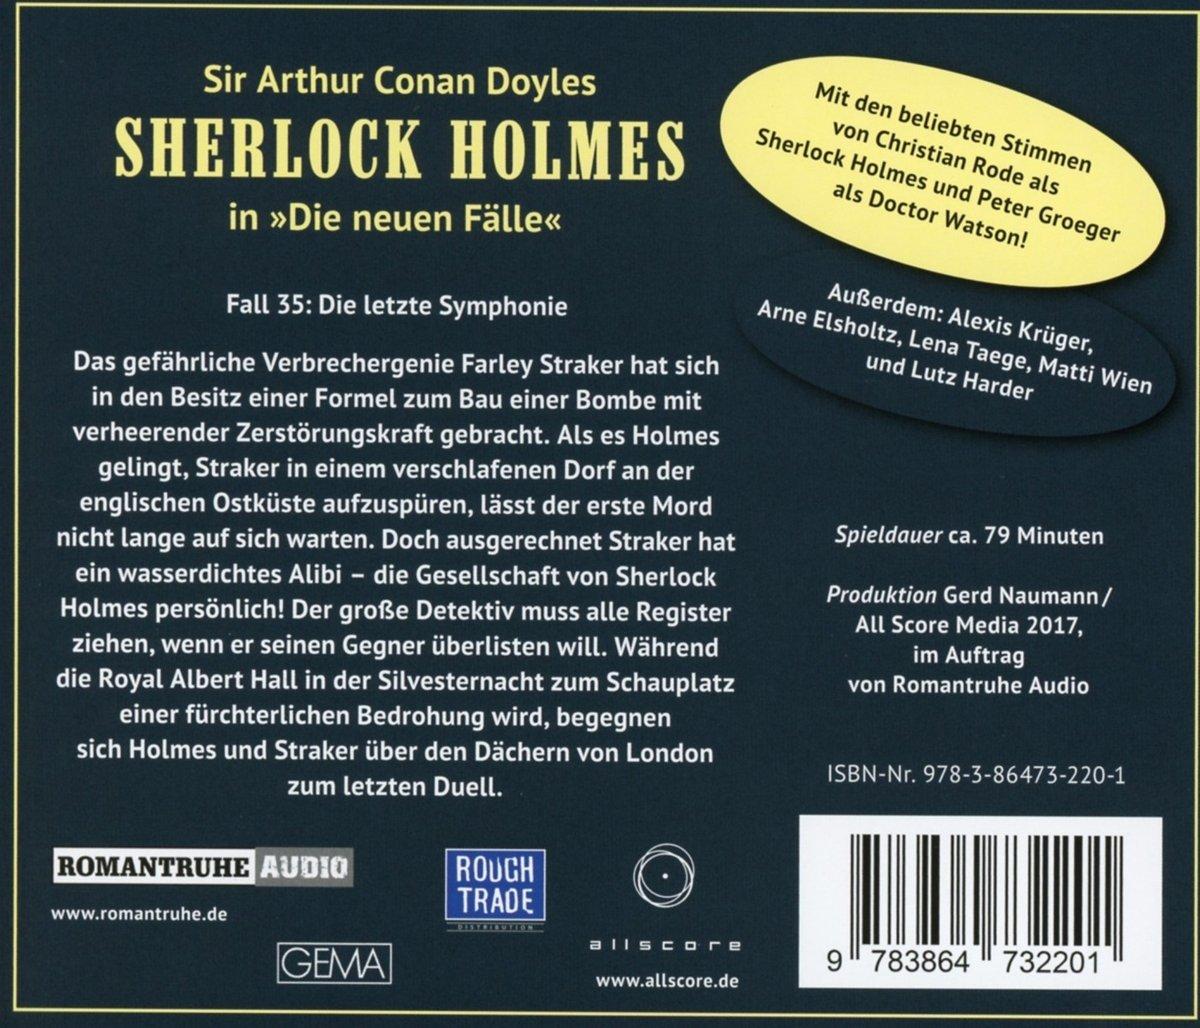 Die Letzte Symphonie (Neue Fälle 35) - Sherlock Holmes: Amazon.de: Musik